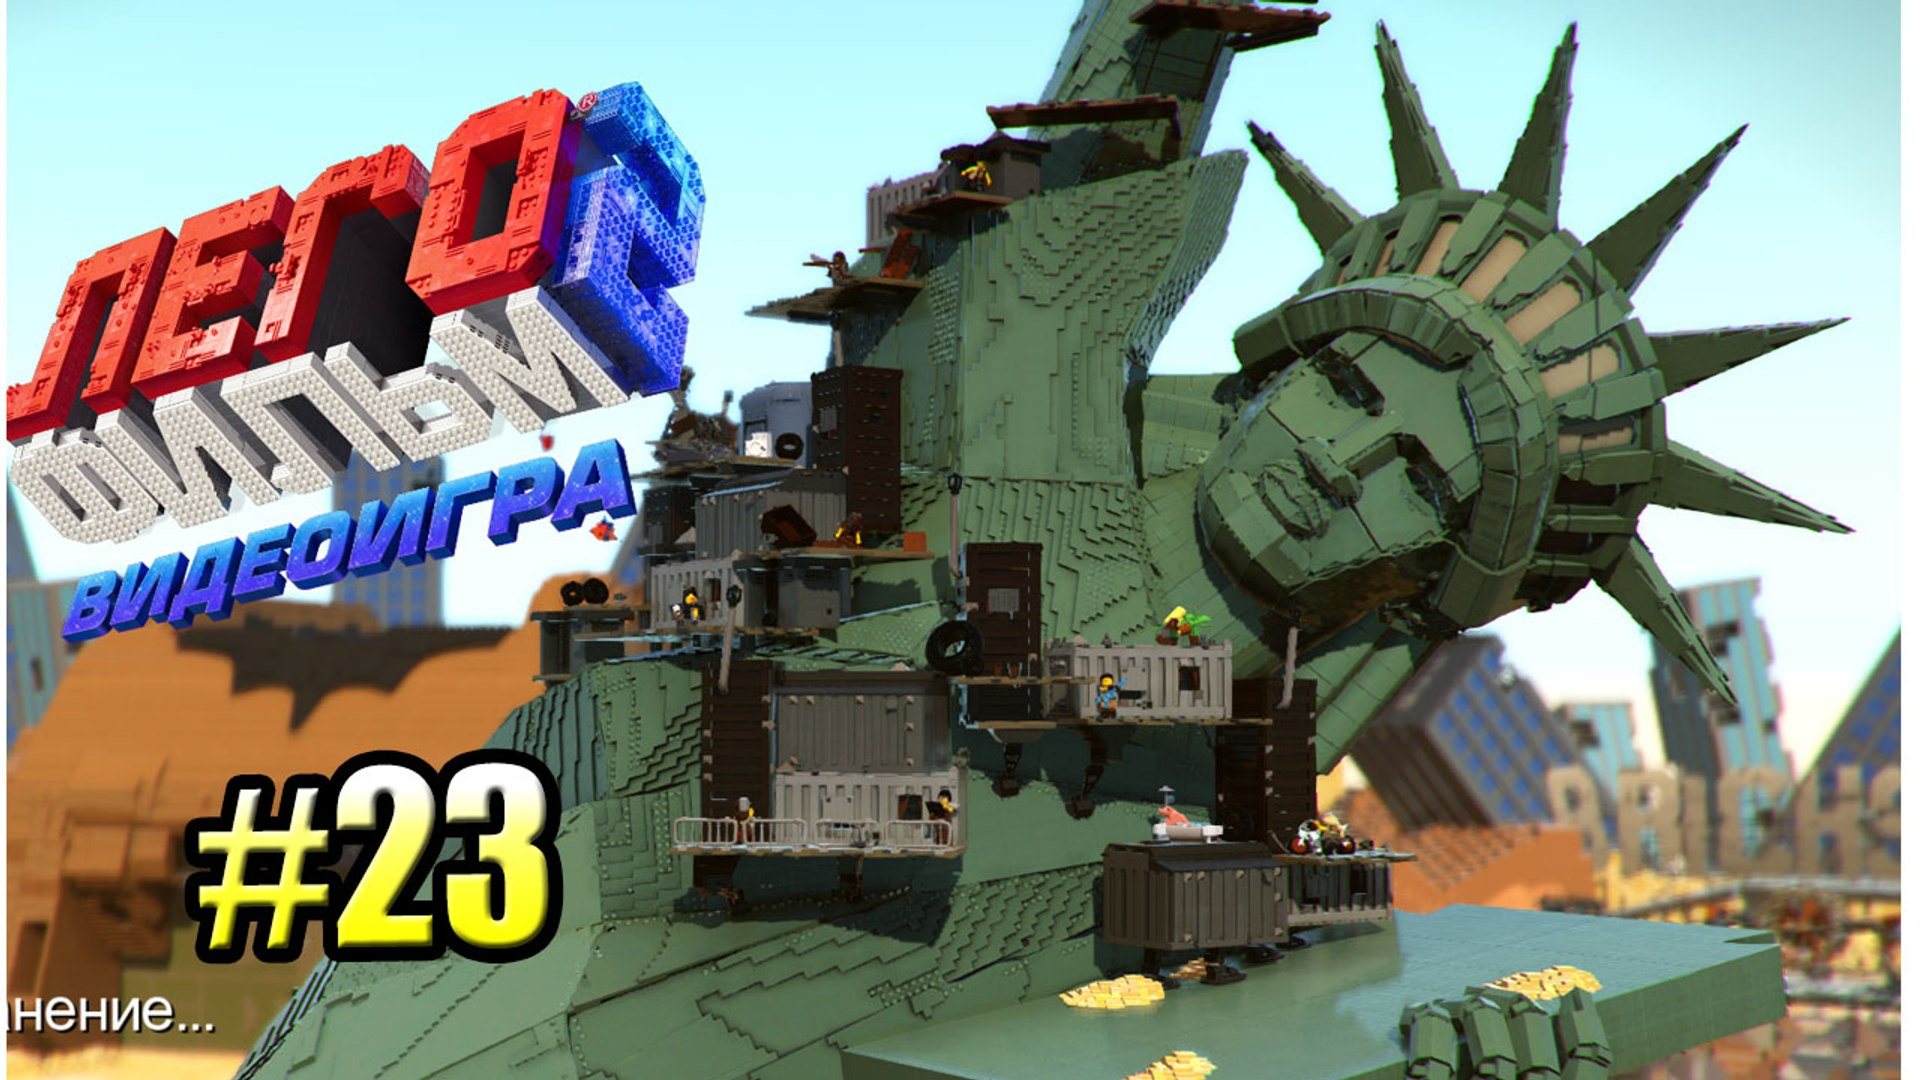 The LEGO Movie 2 Videogame прохождение #23 на русском {PC} Планета Спарклс на 100%